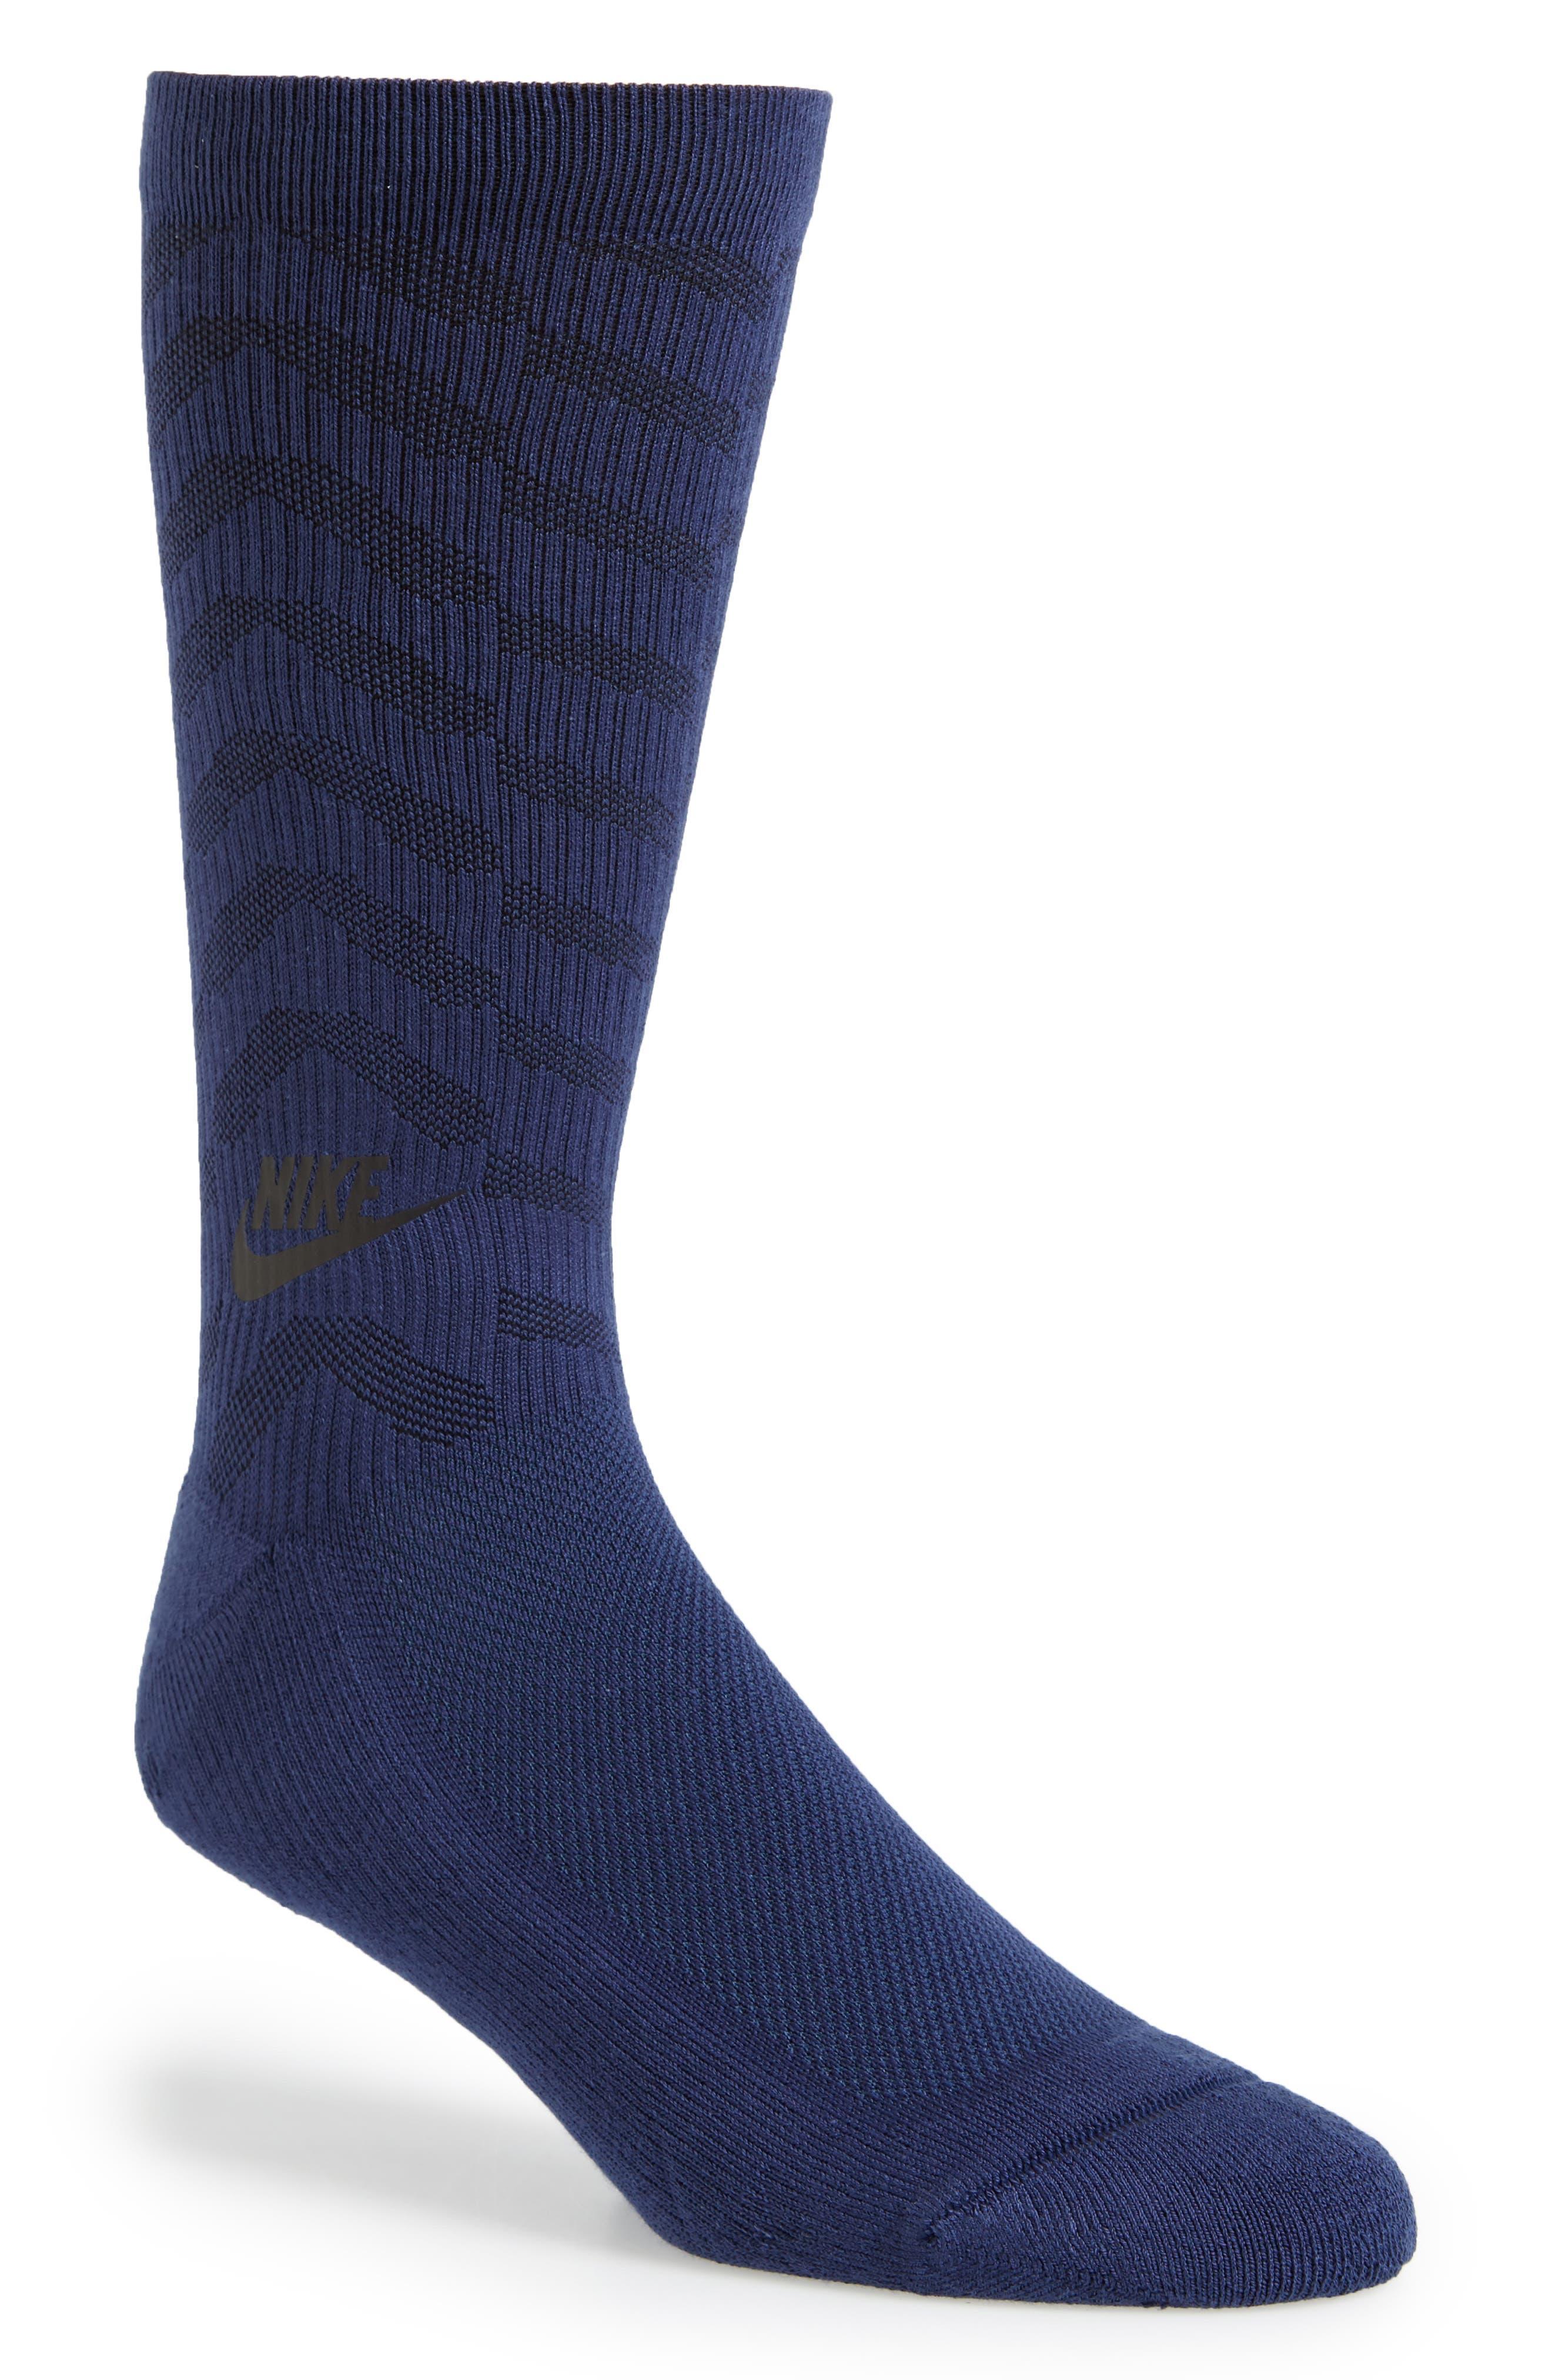 Statement Graphic Socks,                         Main,                         color, Binary Blue